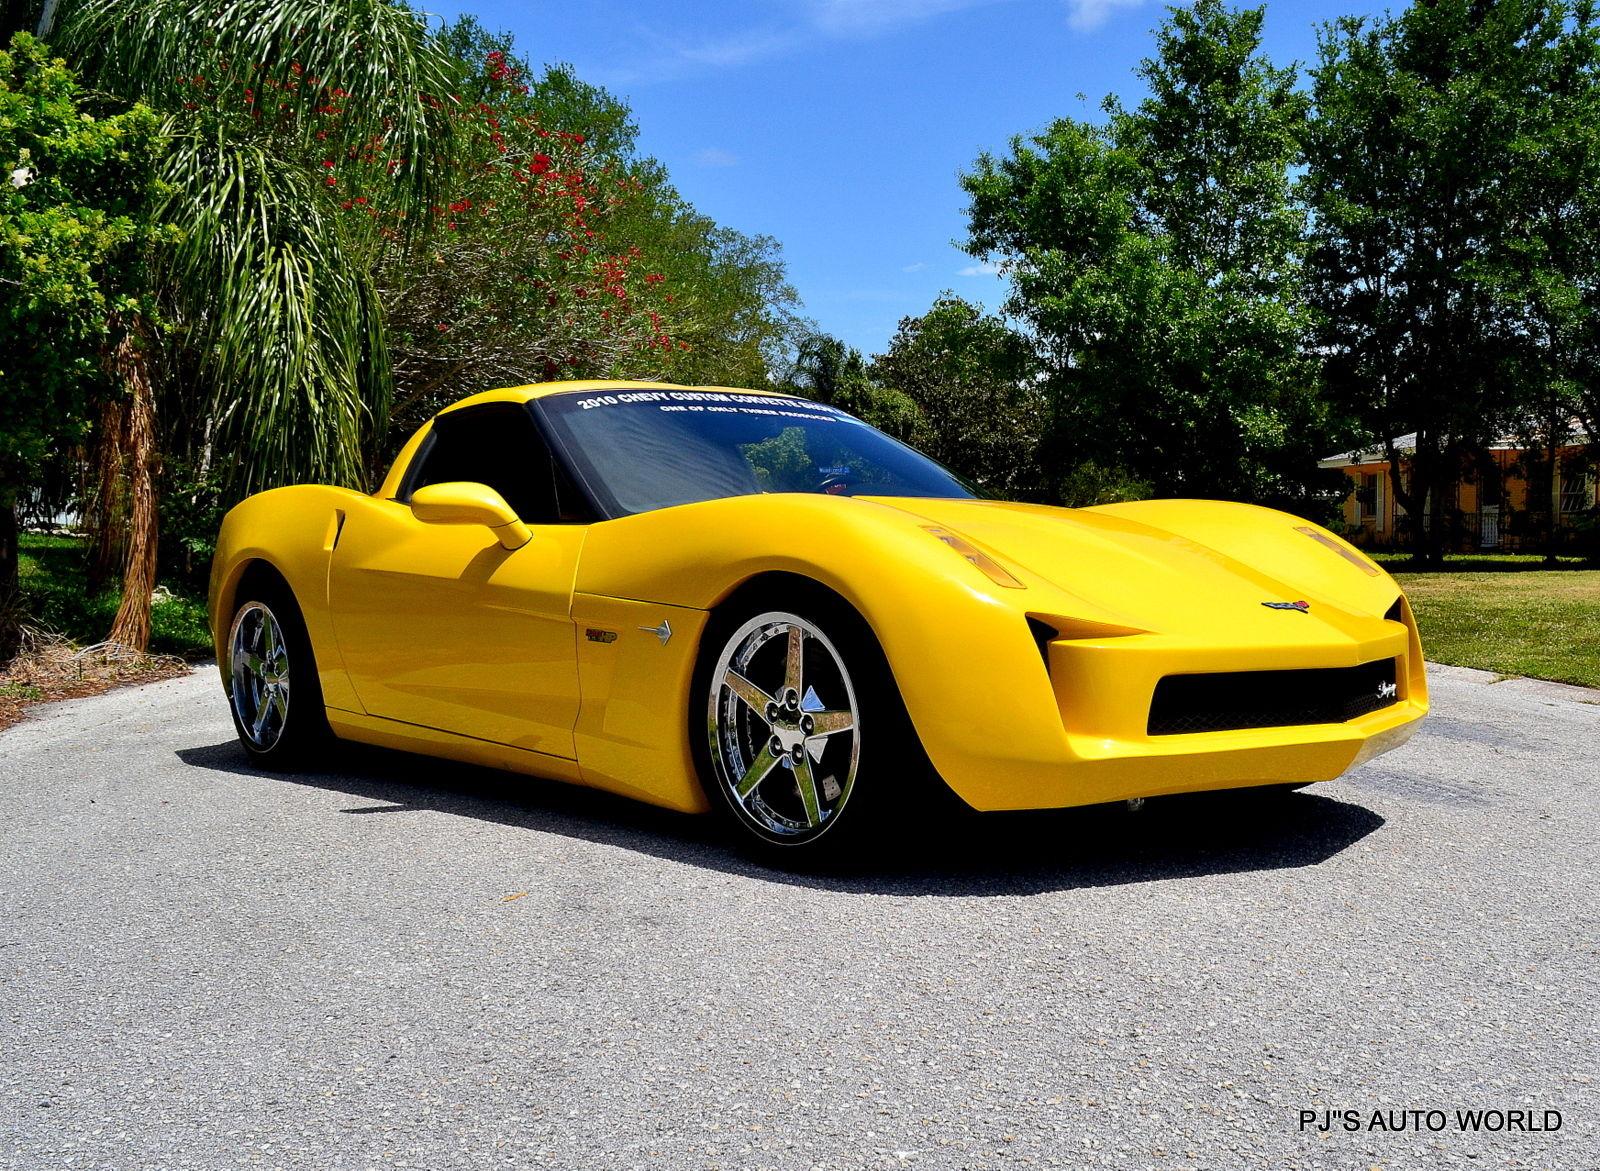 Corvette 2010 For Sale >> C7 Corvette Stingray Concept Replica Looks Just Plain Wrong | Carscoops